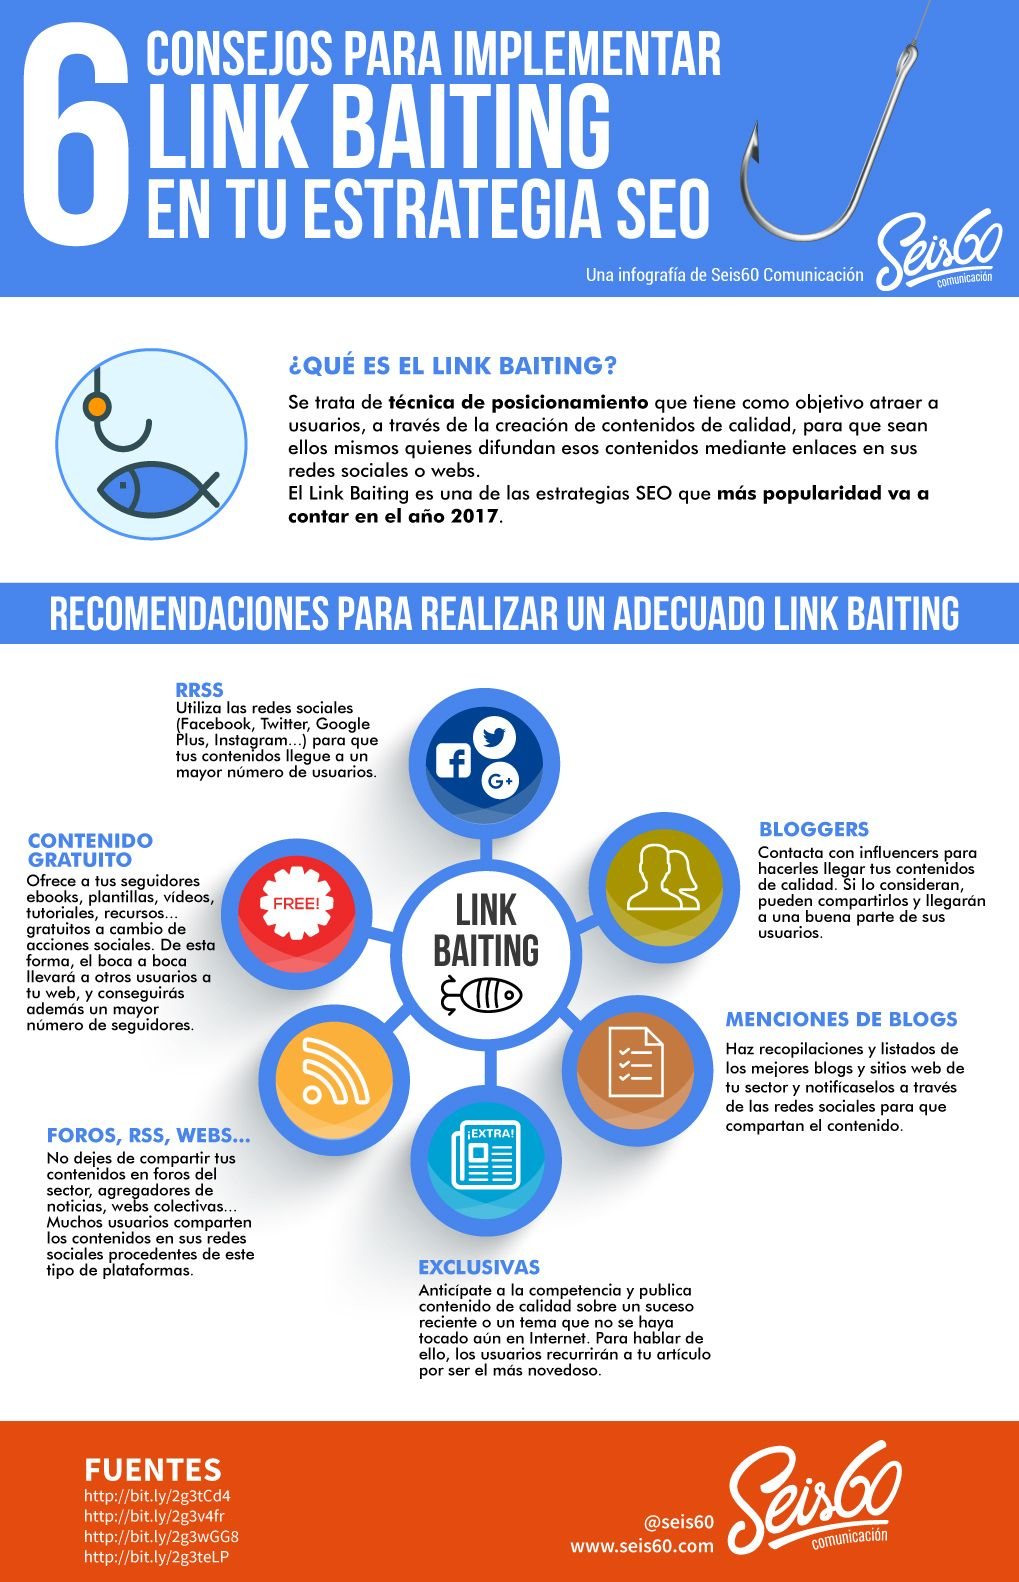 6 consejos para implementar Link Baiting en tu estrategia SEO ...